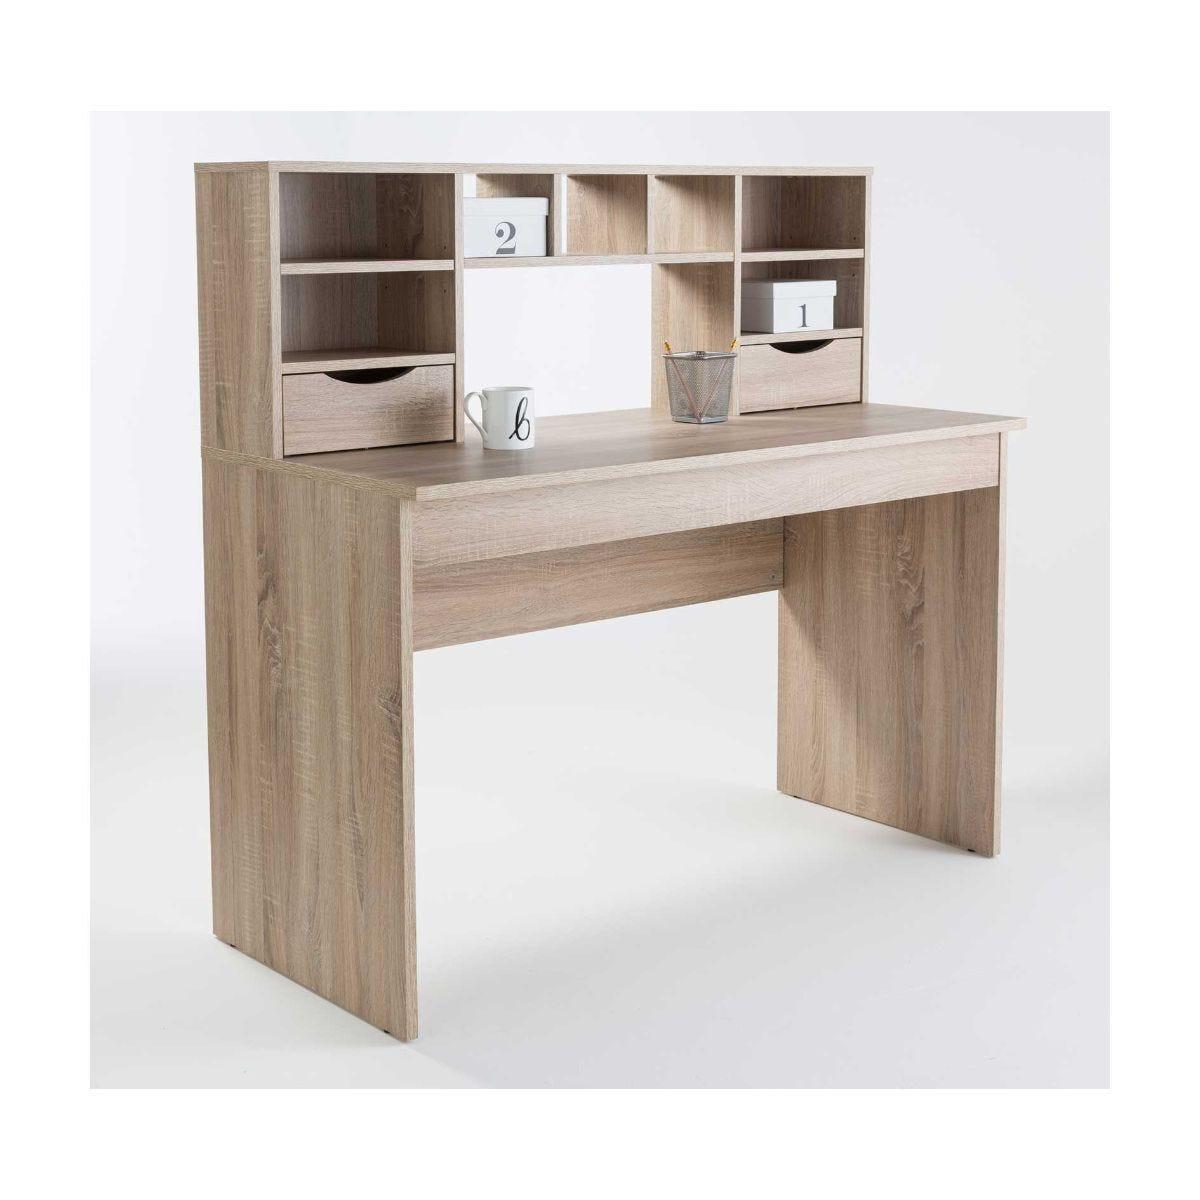 Alphason Albion Light Oak Effect Office Desk with Hutch Shelving